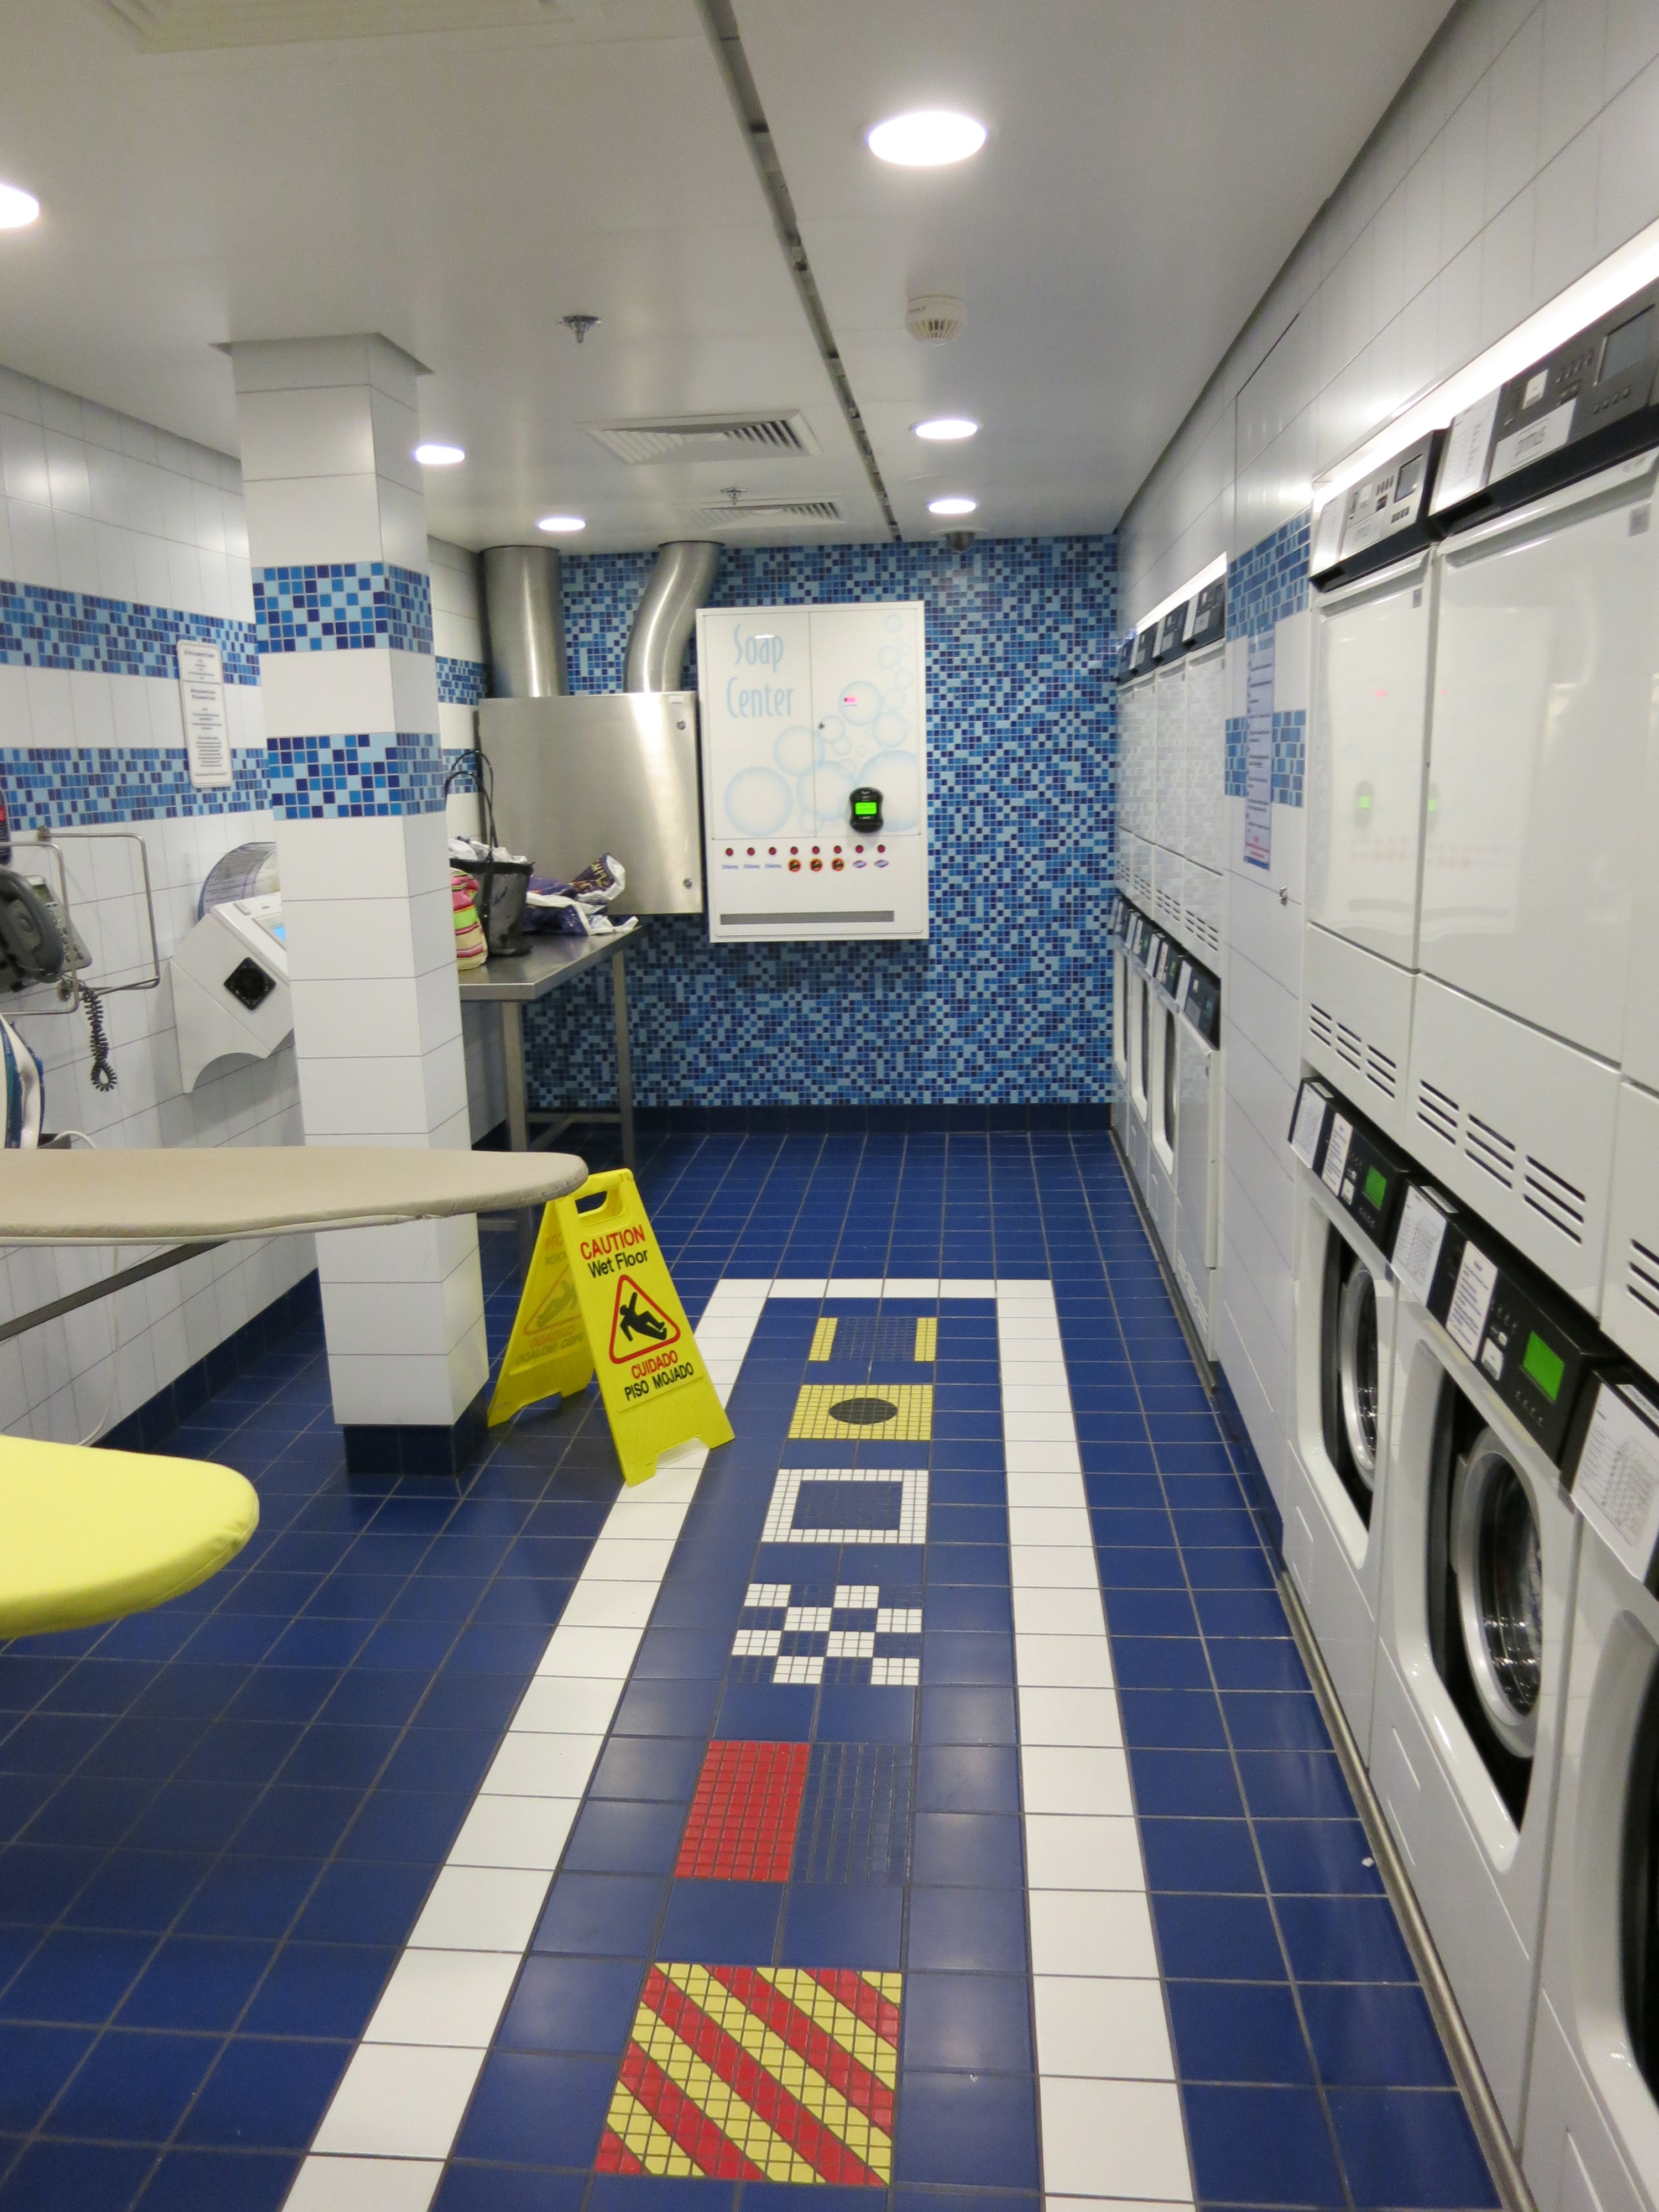 self service laundry business plan pdf